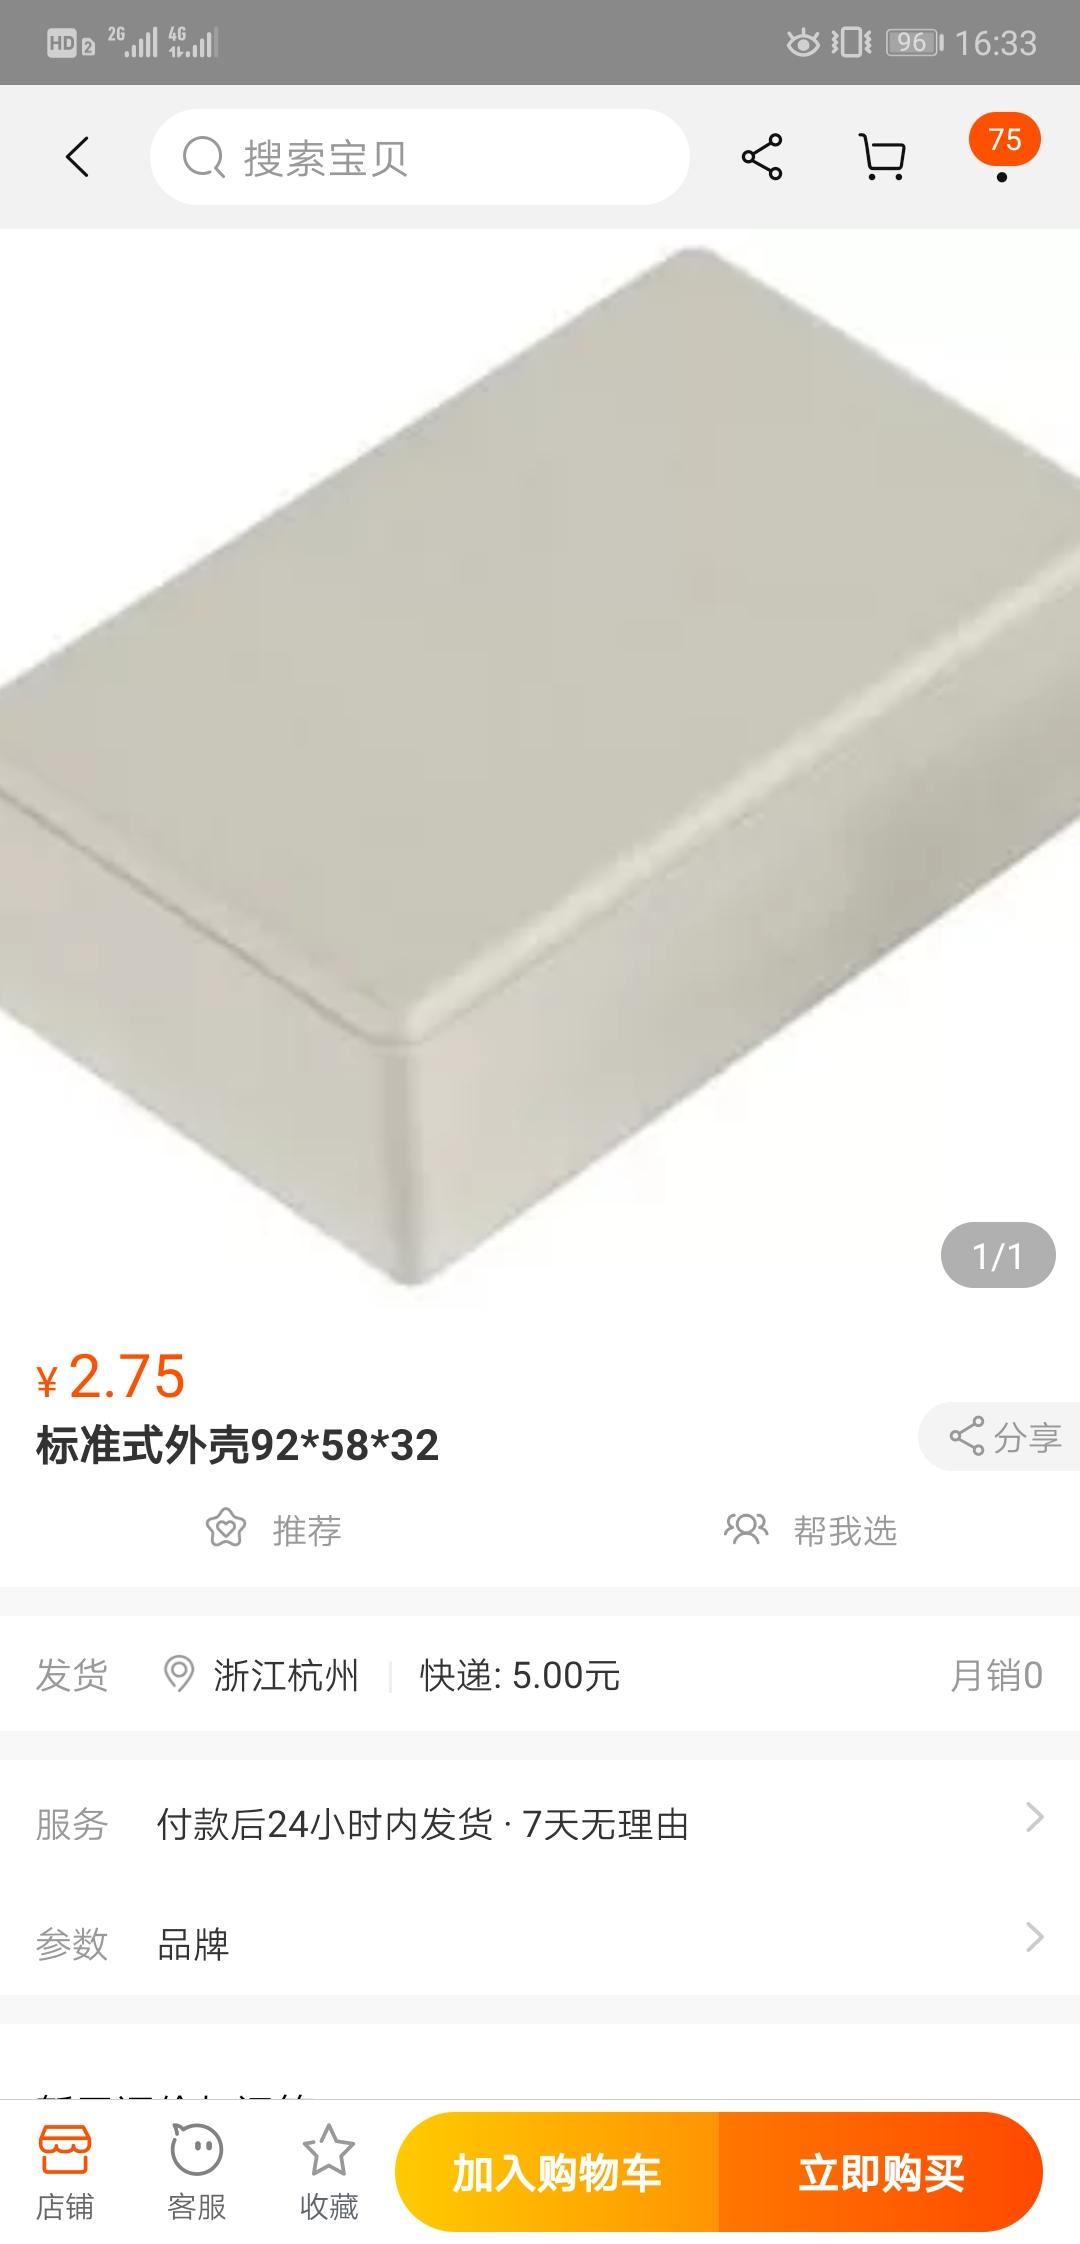 Screenshot_20191102_163346_com.taobao.taobao.jpg